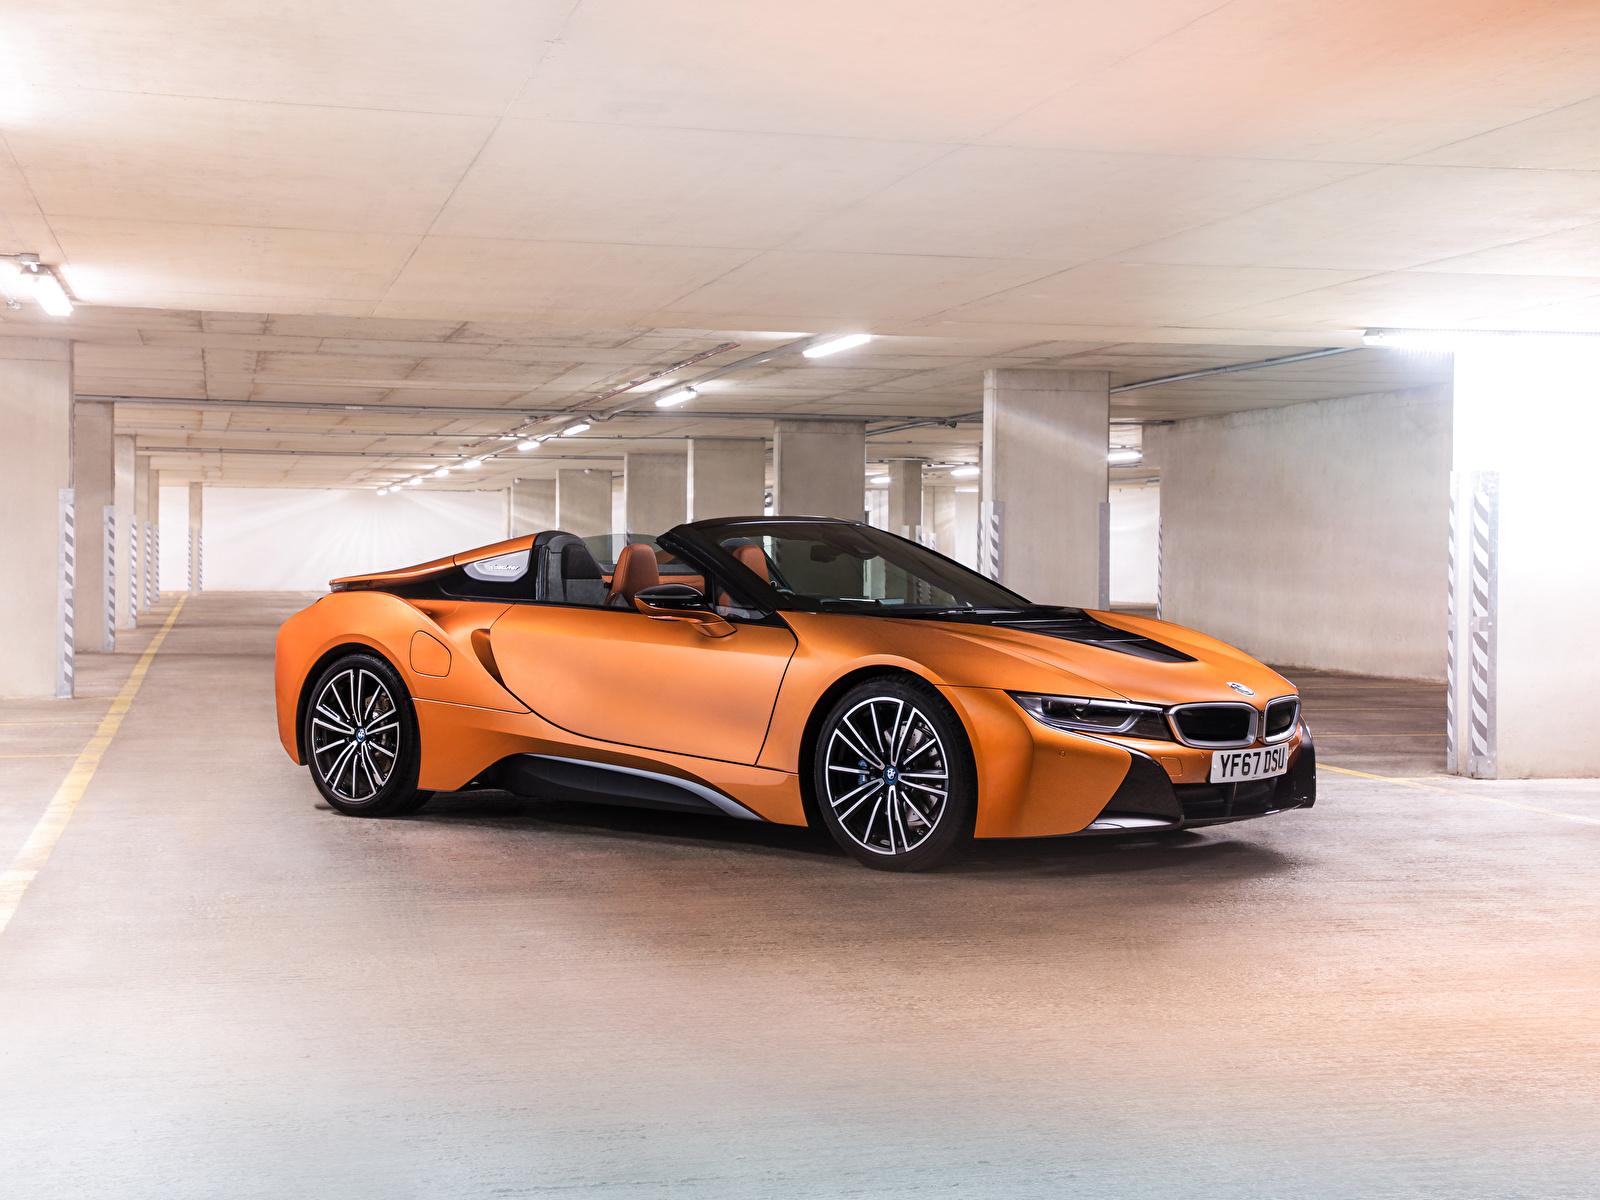 Фото BMW 2018 i8 Roadster Родстер Оранжевый Авто 1600x1200 БМВ оранжевых оранжевые оранжевая Машины Автомобили